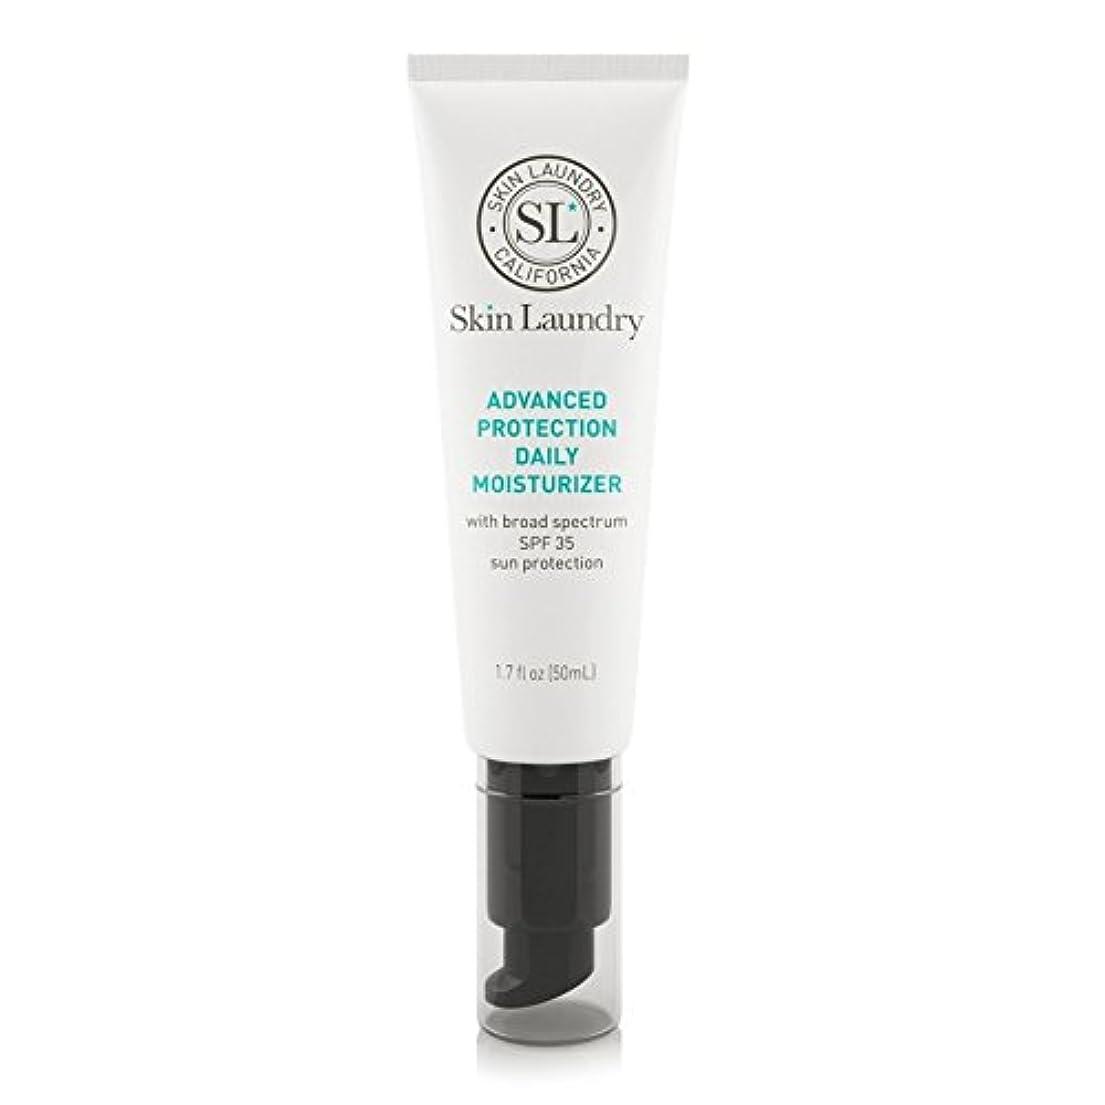 Skin Laundry Advanced Protection Daily Moisturiser 50ml (Pack of 6) - 皮膚の洗濯高度な保護毎日保湿50ミリリットル x6 [並行輸入品]